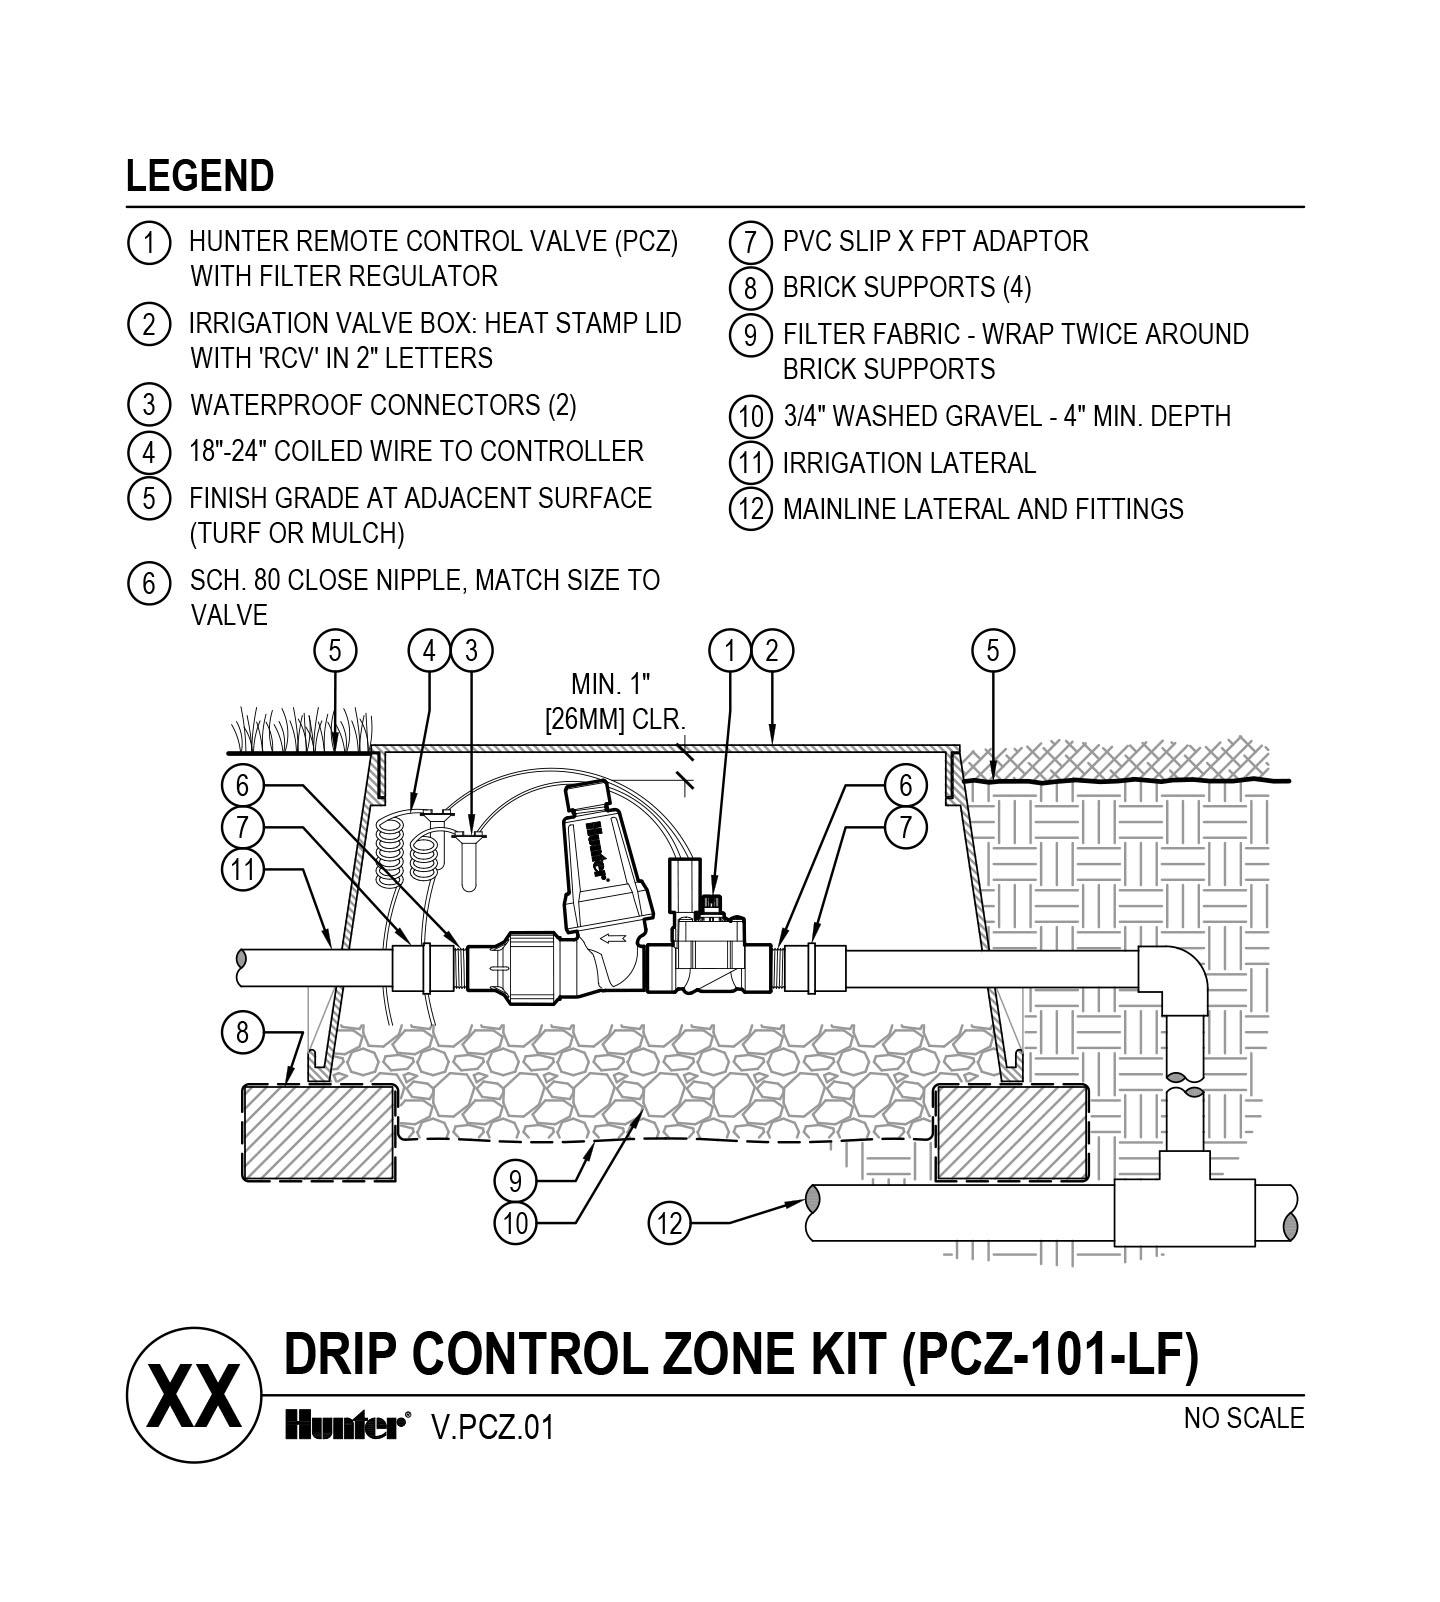 CAD - PCZ-101-LF